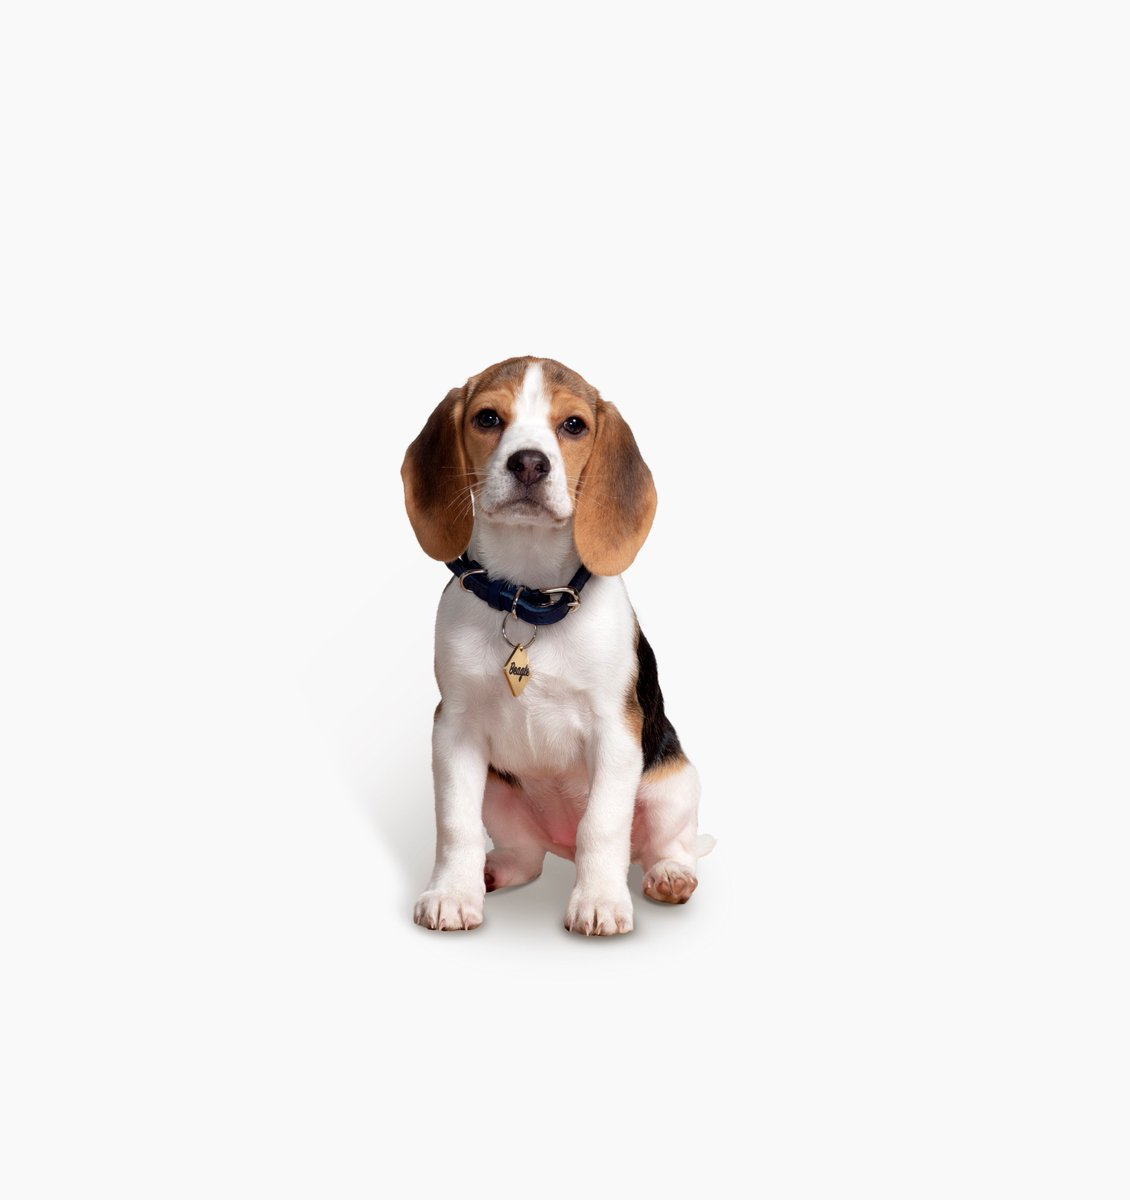 Beagle Life Insurance >> Beagle Street On Twitter Beagle Wants To Wish You A Happy